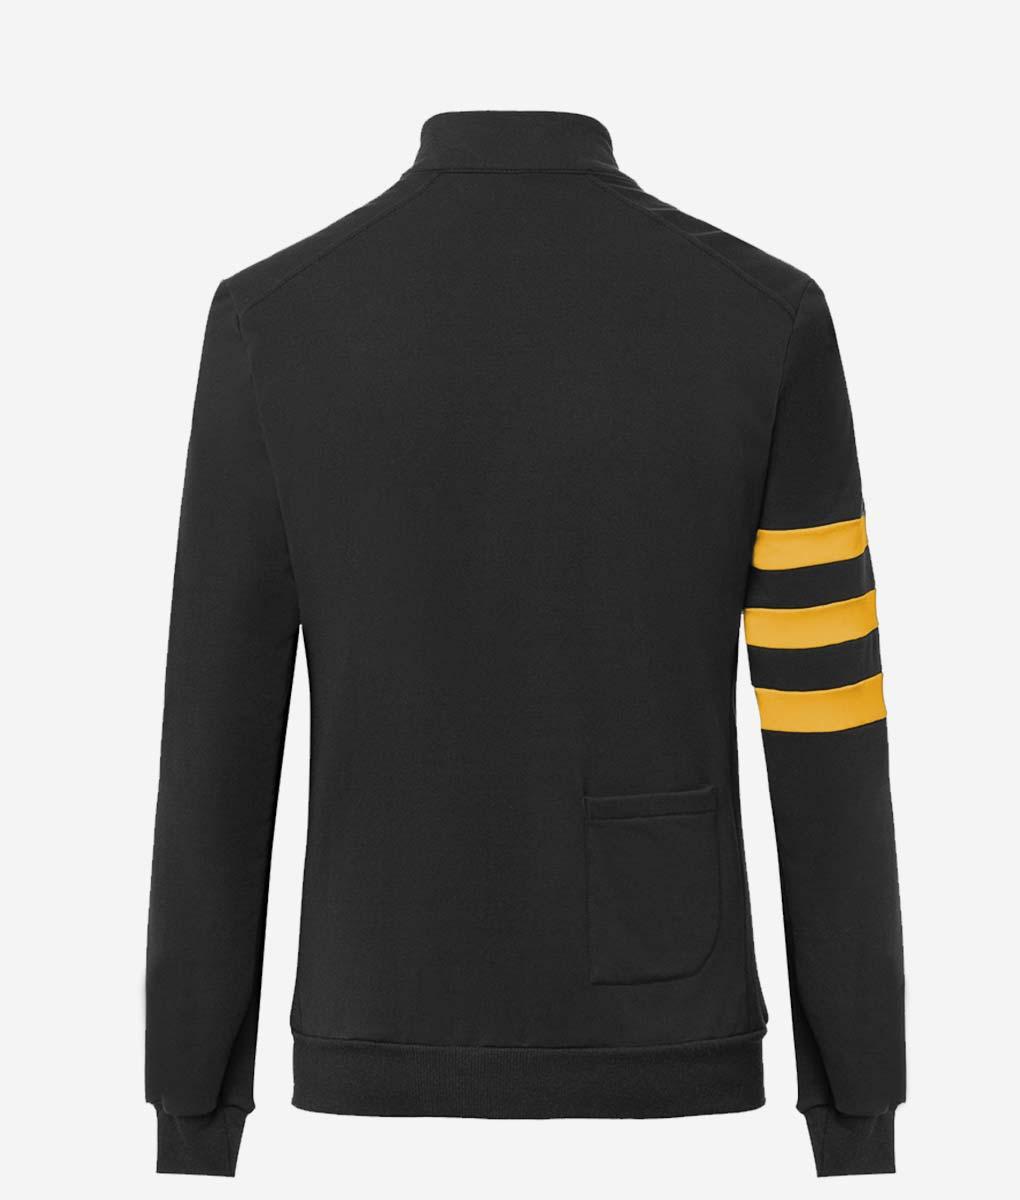 casual-cycling-jacket-fluor-black-back